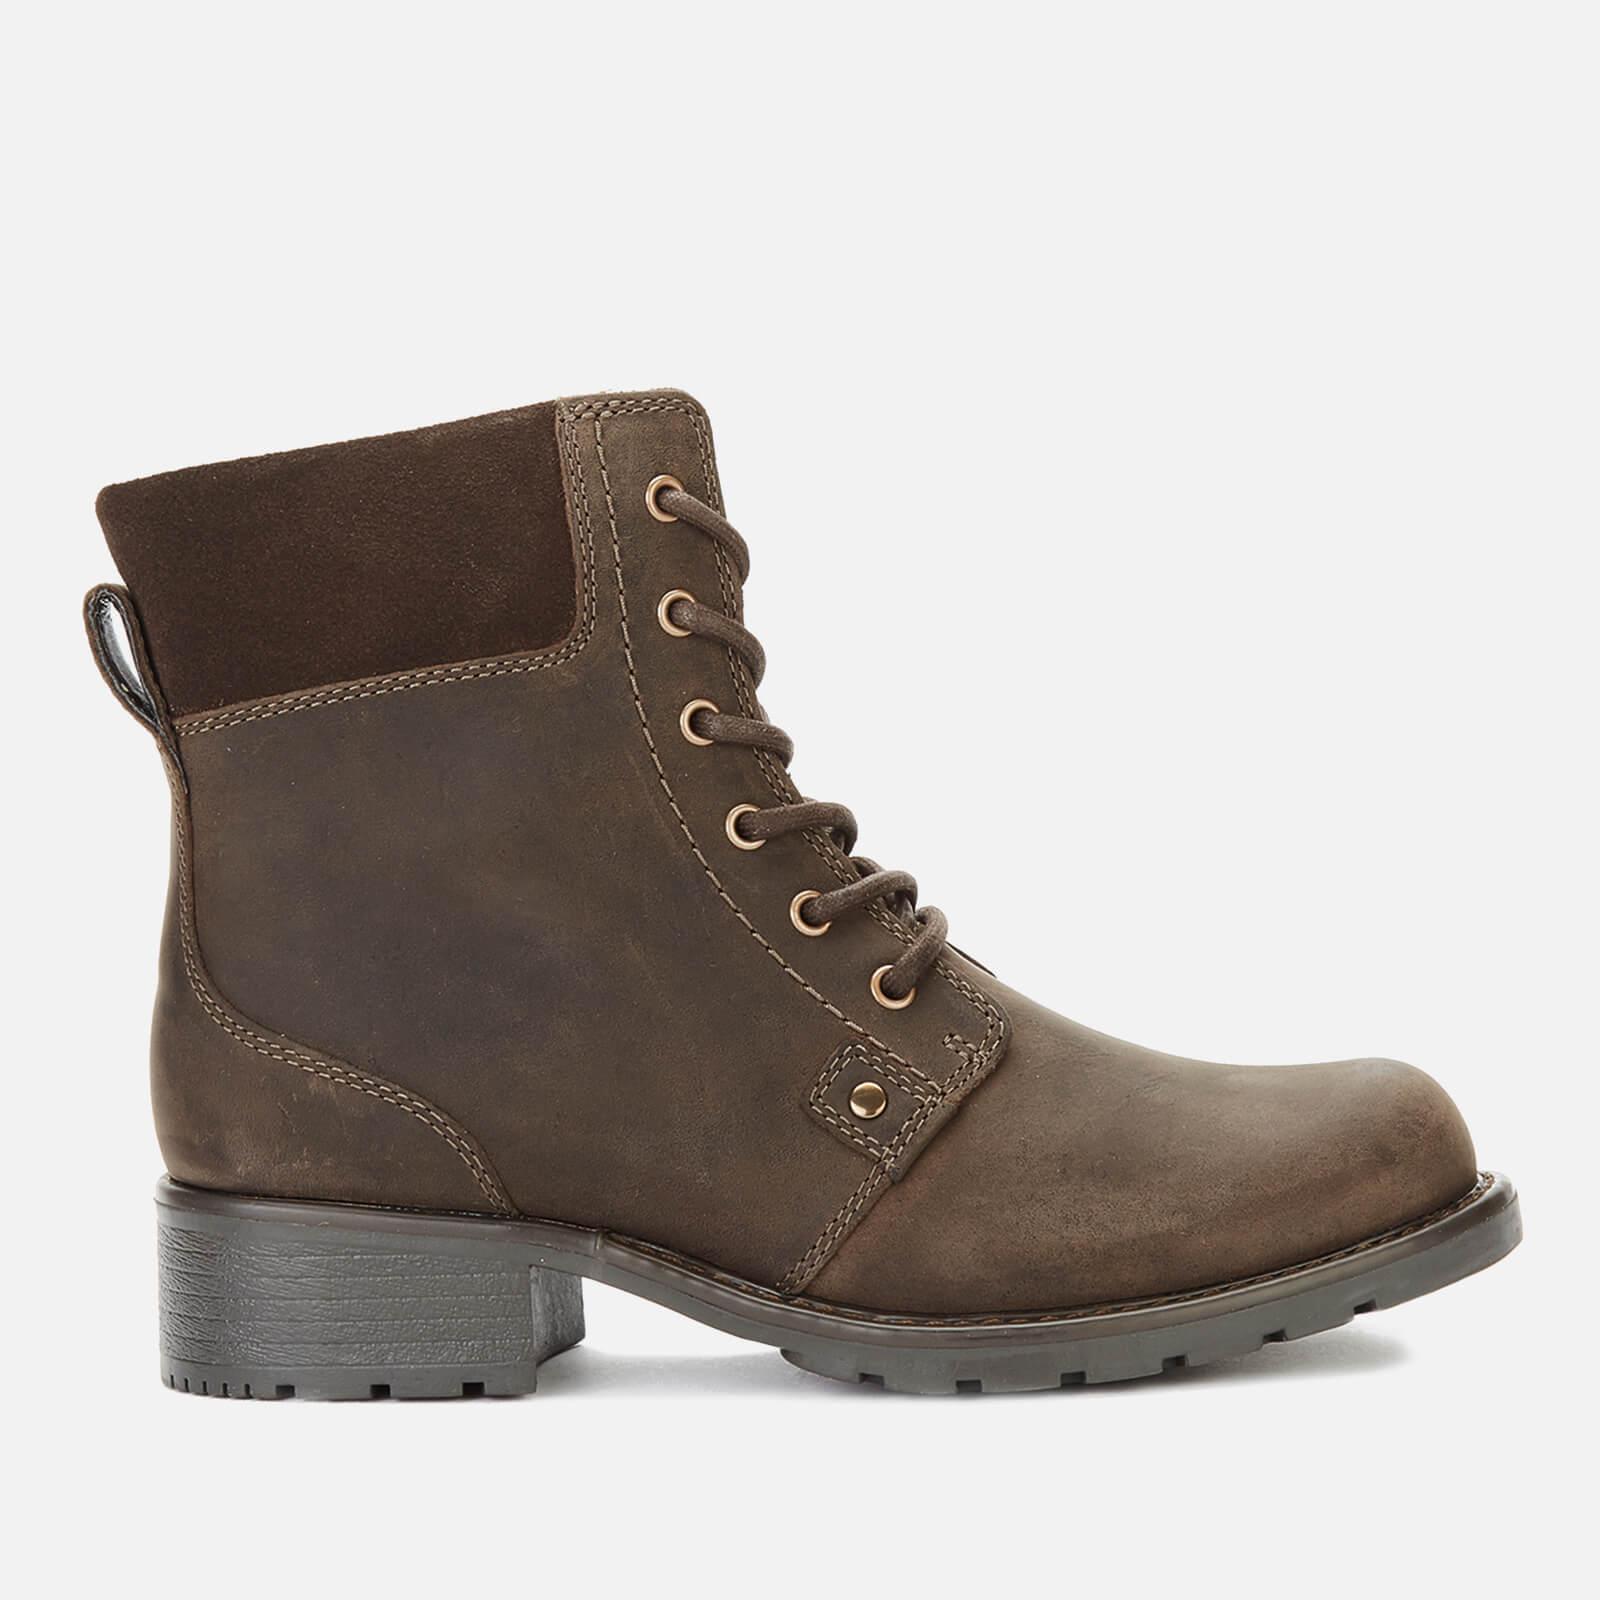 Clarks Women's Orinoco Spice Nubuck Lace Up Boots - Dark Brown - UK 7